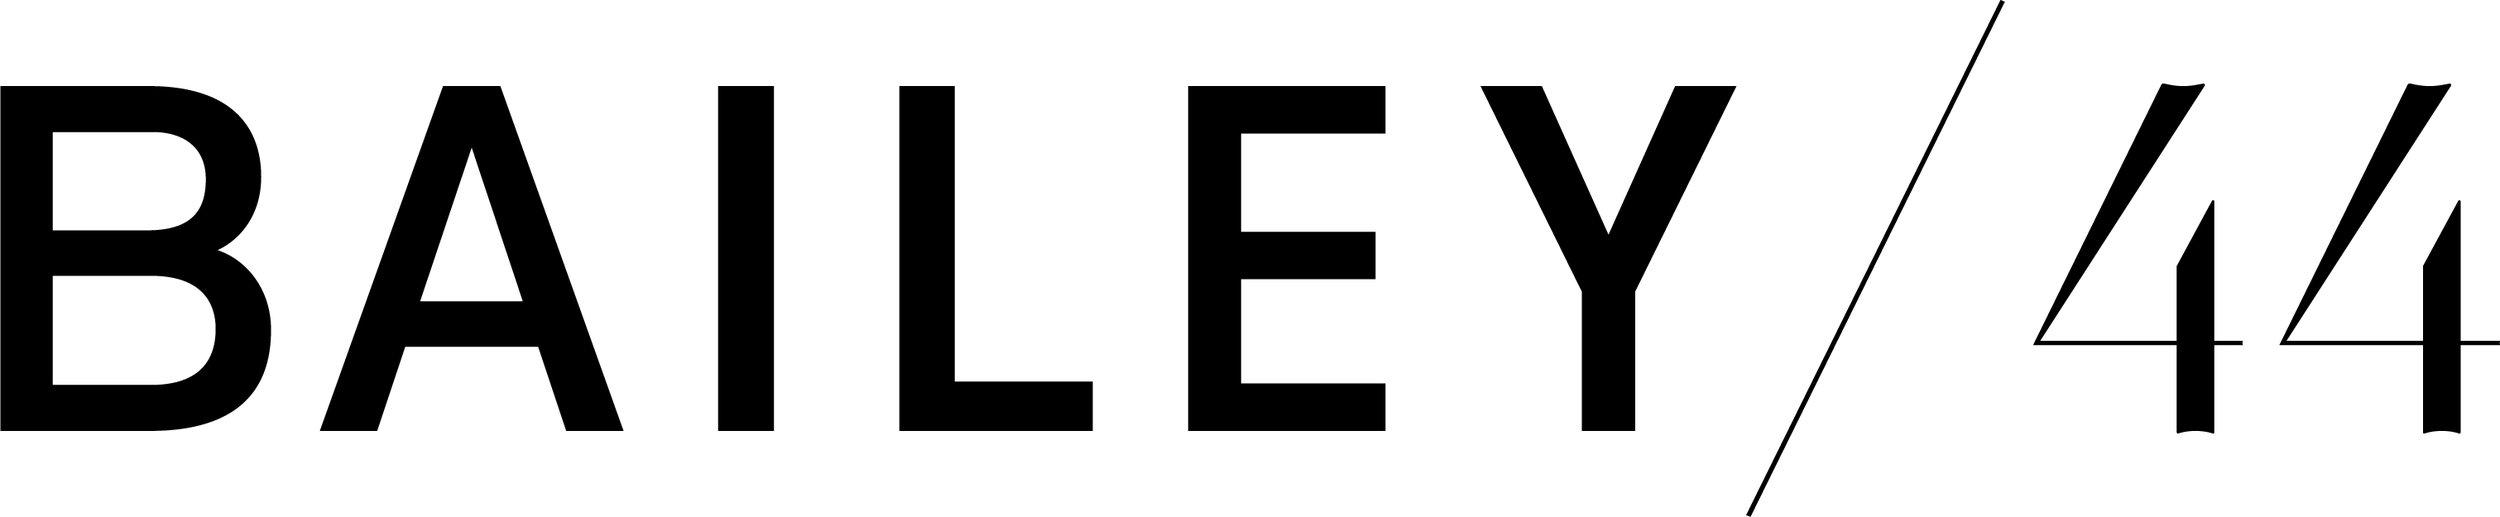 bailey44_logo.jpg